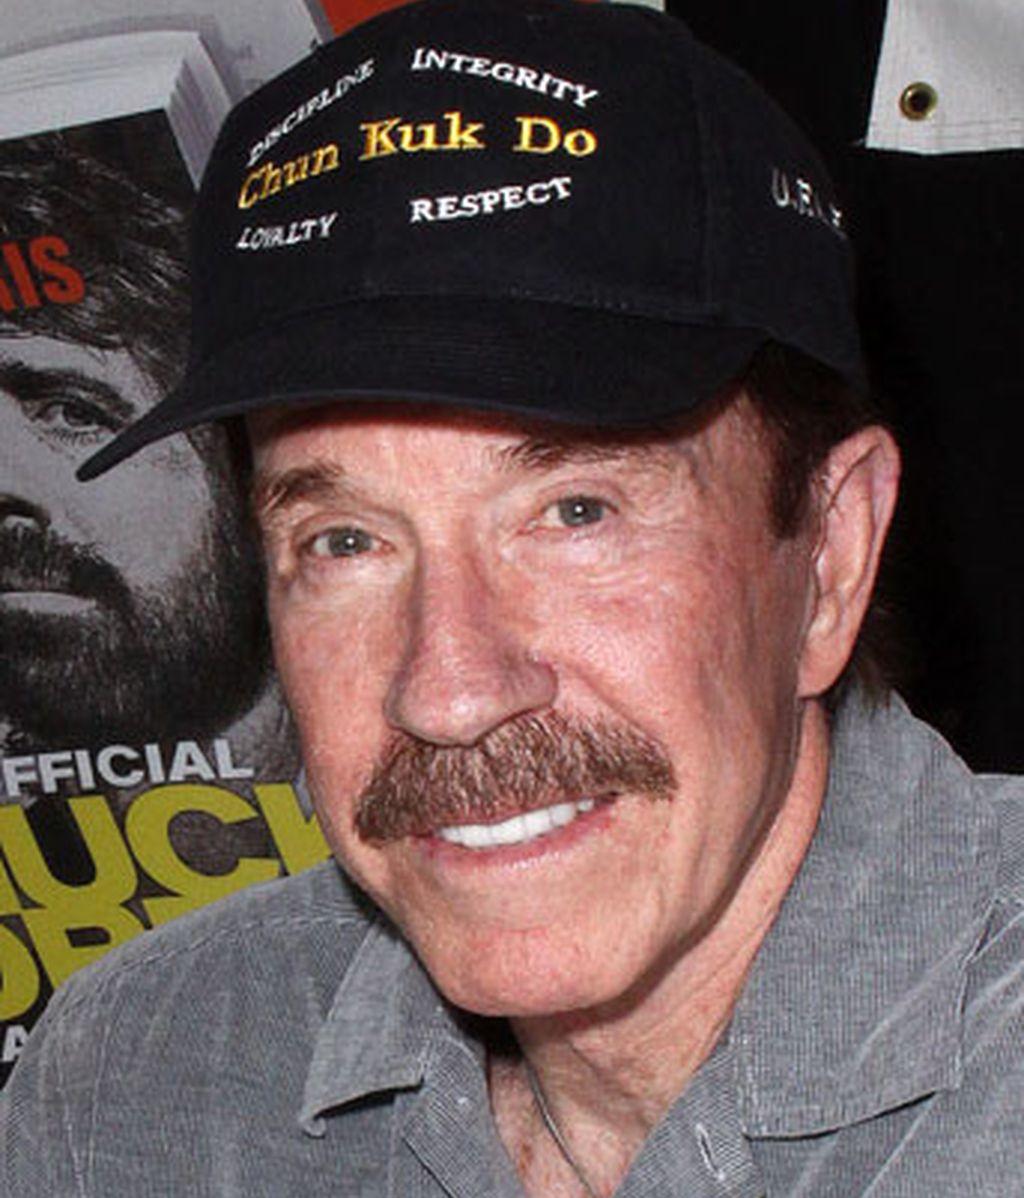 Chuck Norris = Carlos Ray